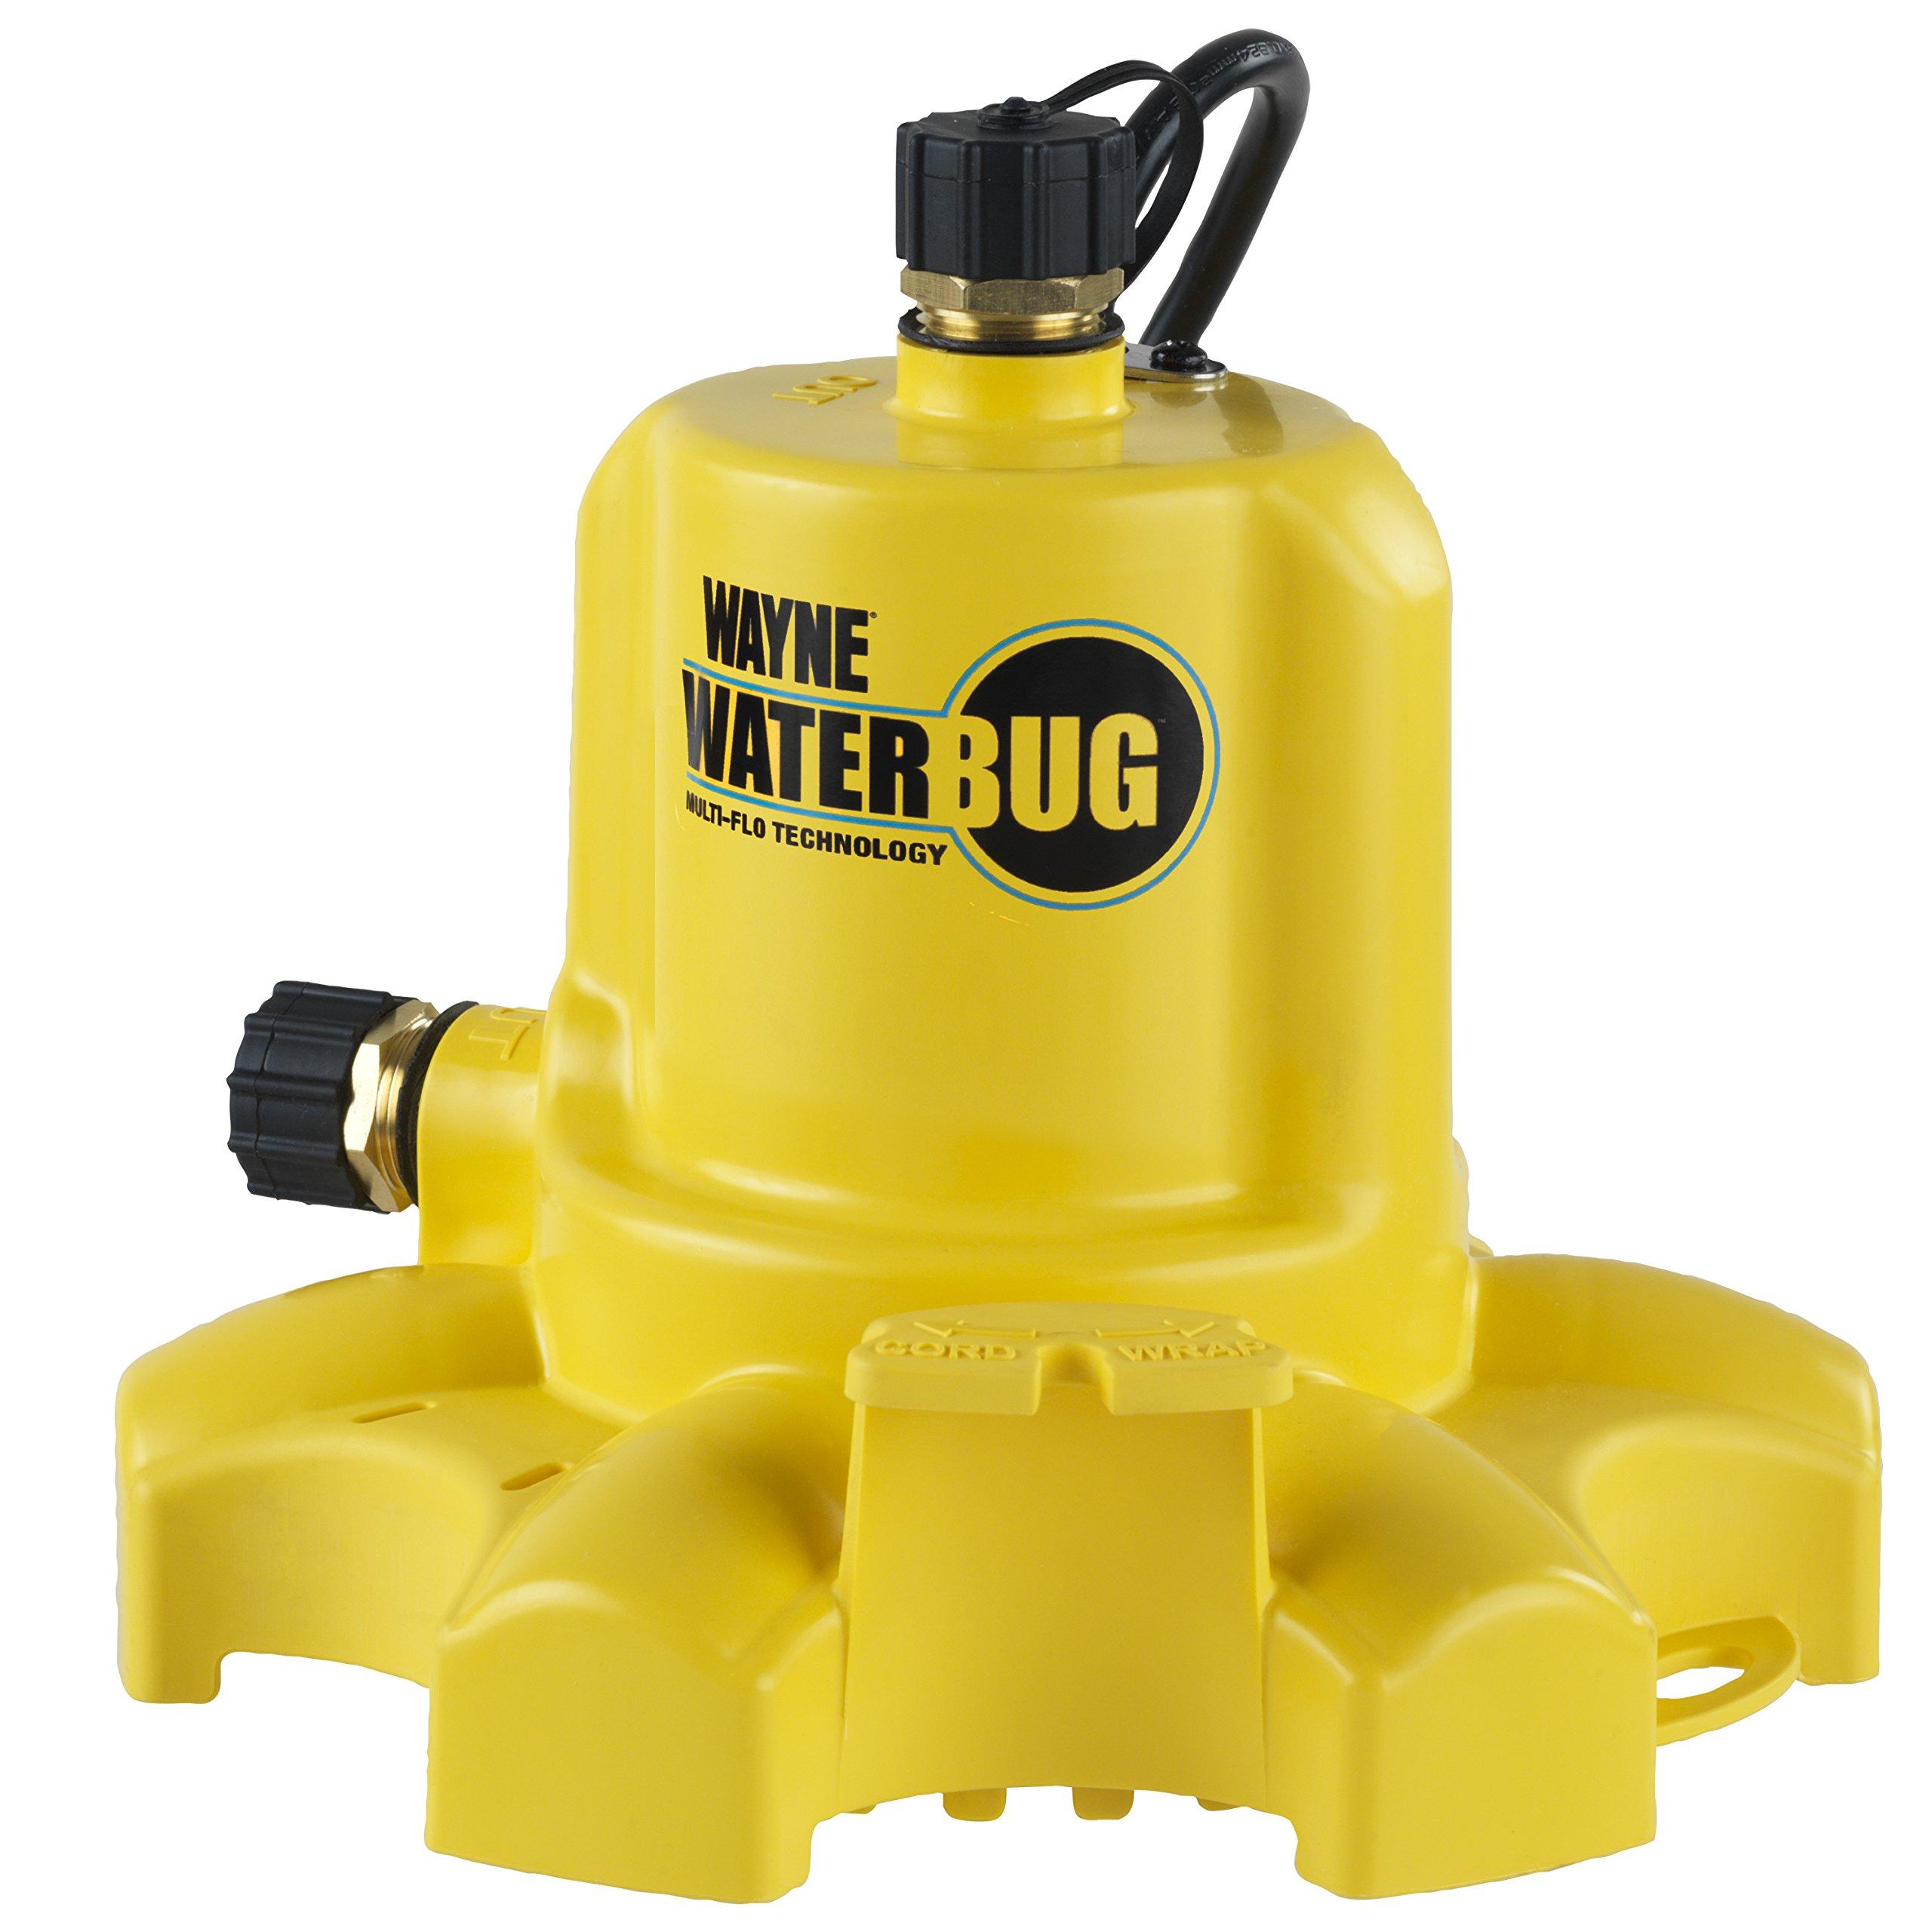 WAYNE WWB WaterBUG Submersible Pump with Multi-Flo Technology by Wayne